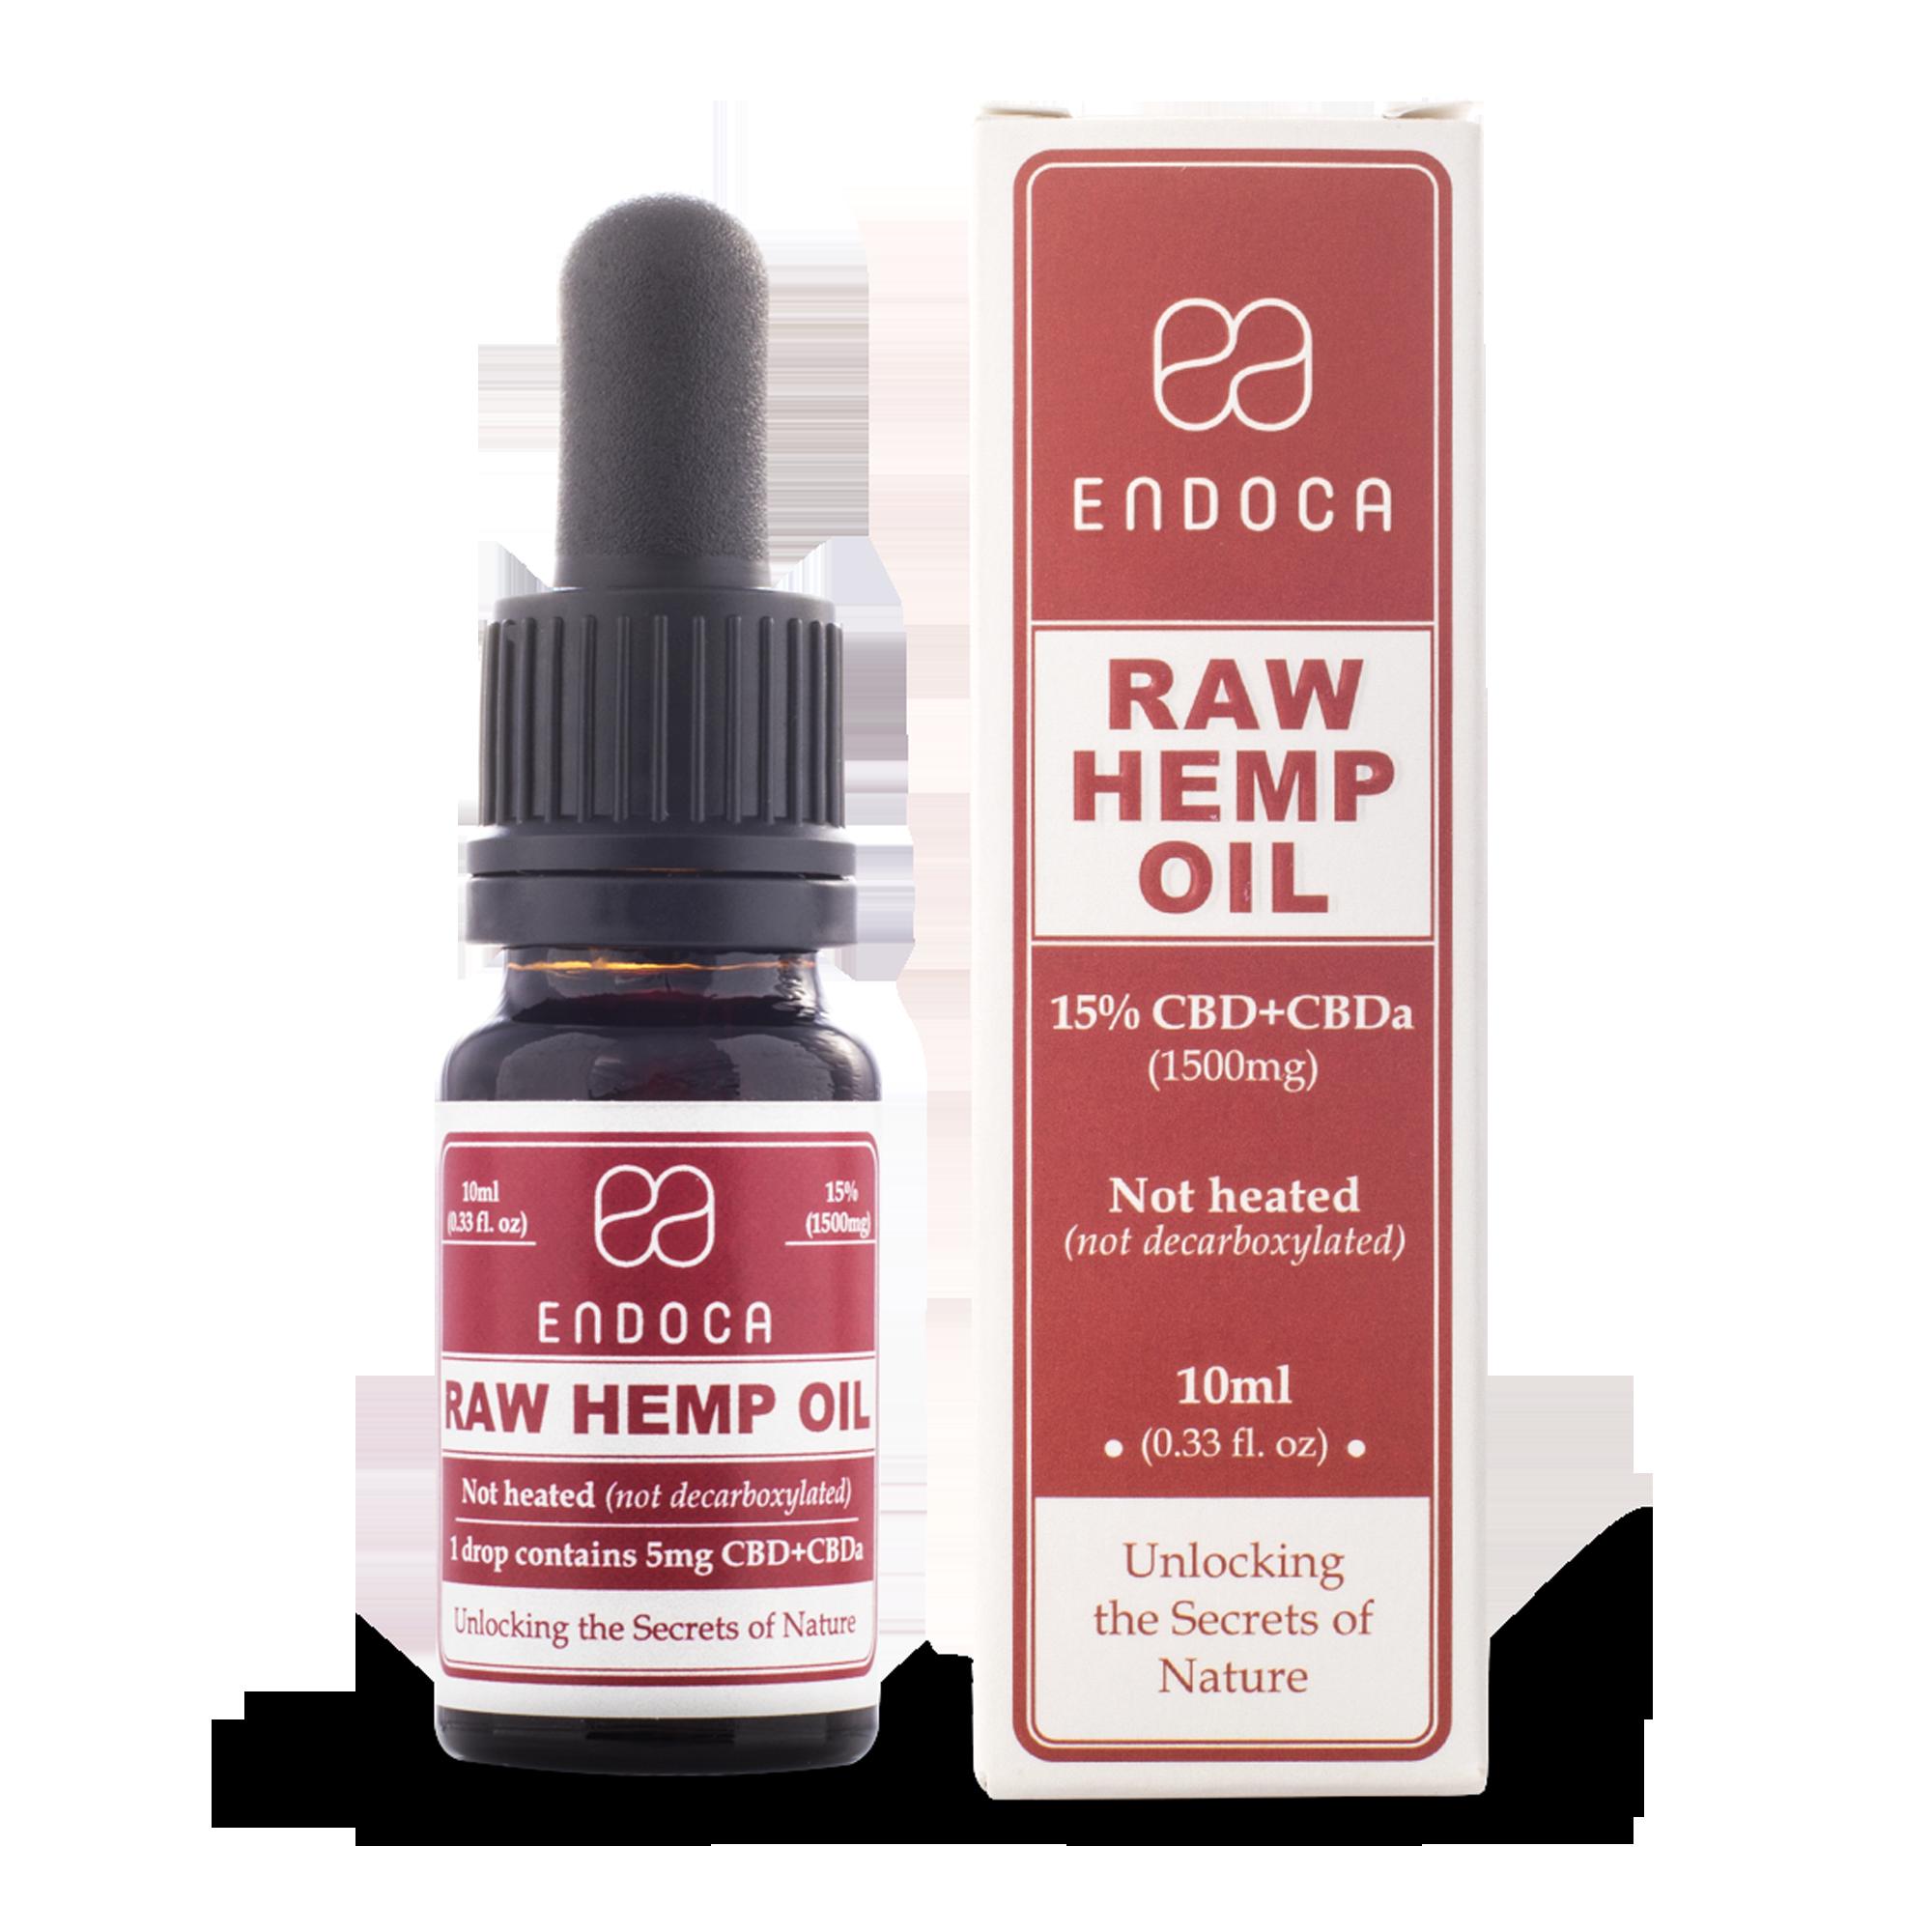 CBD Öl 15% | rohes Hanf-Öl | 10 ml | 1500 mg CBD/CBDa | Endoca im Preisvergleich